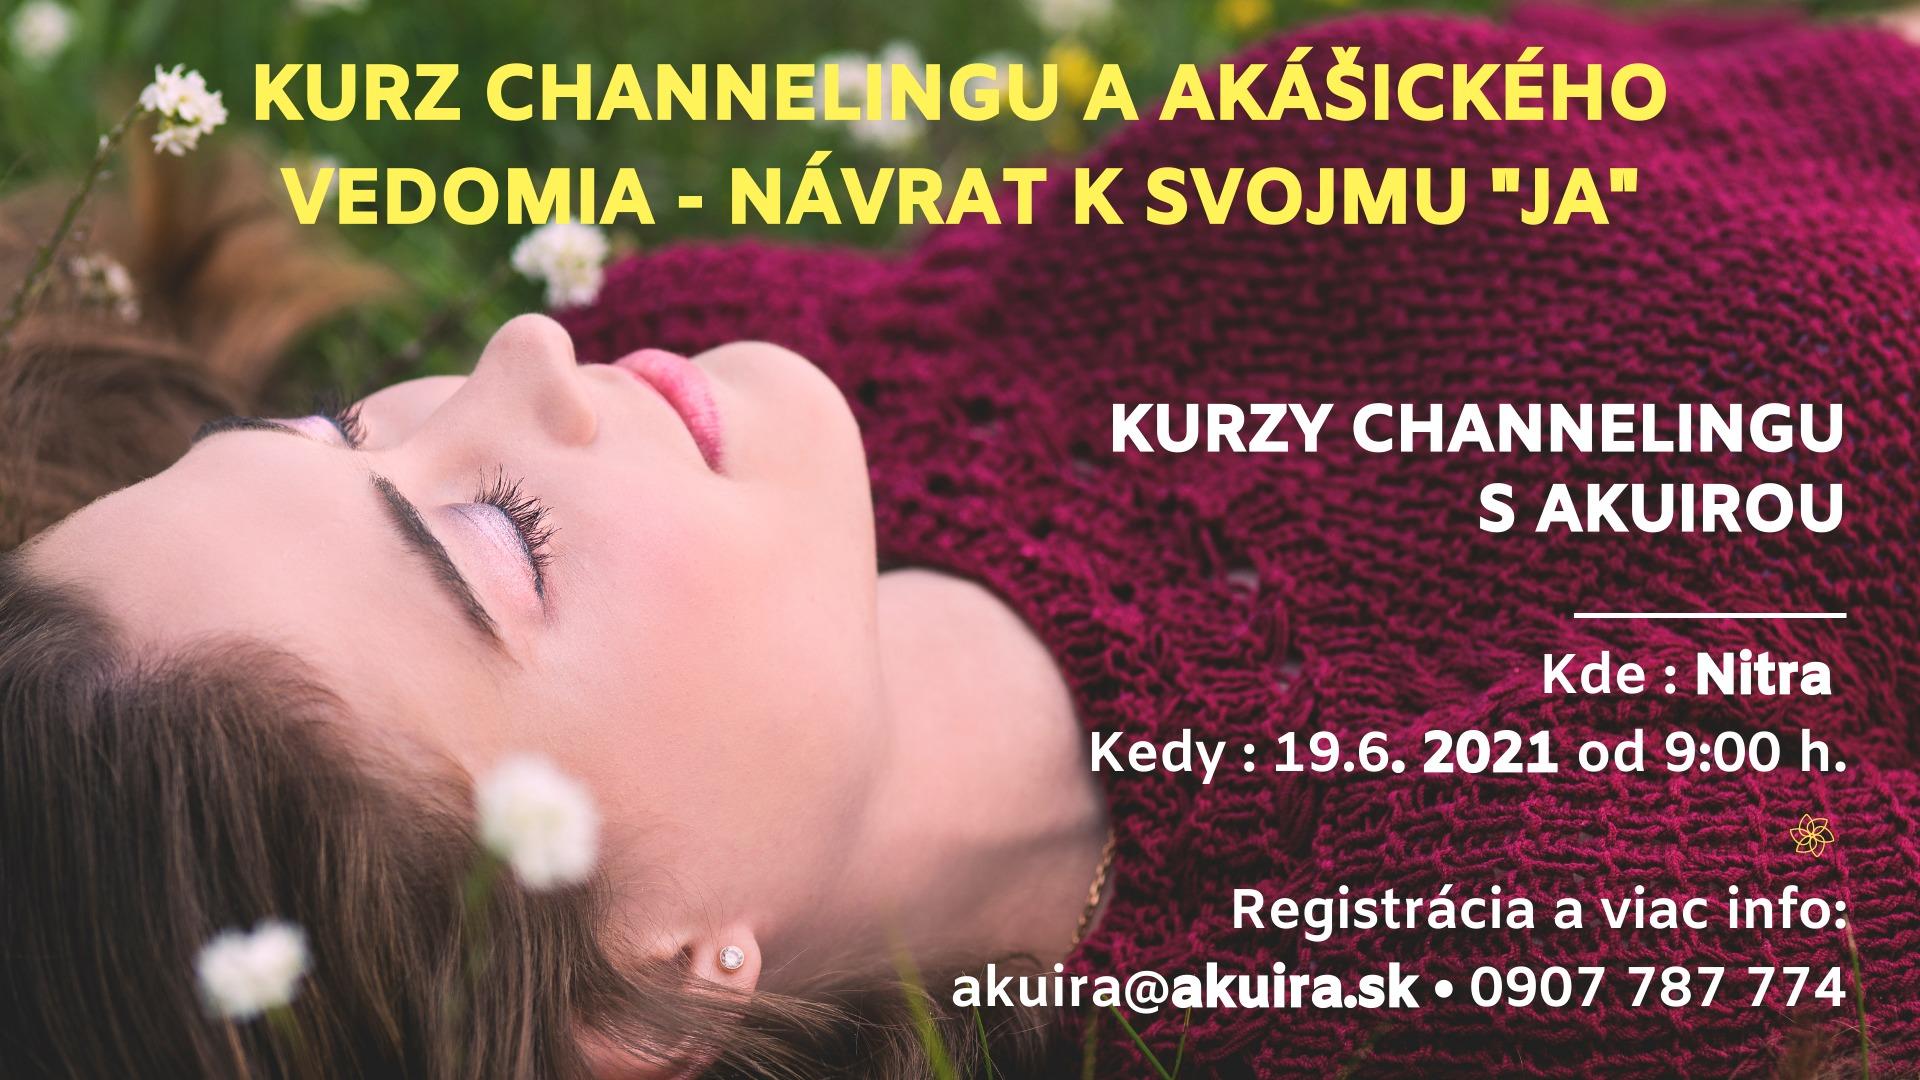 Kurz channeling 19.6.2021 Nitra